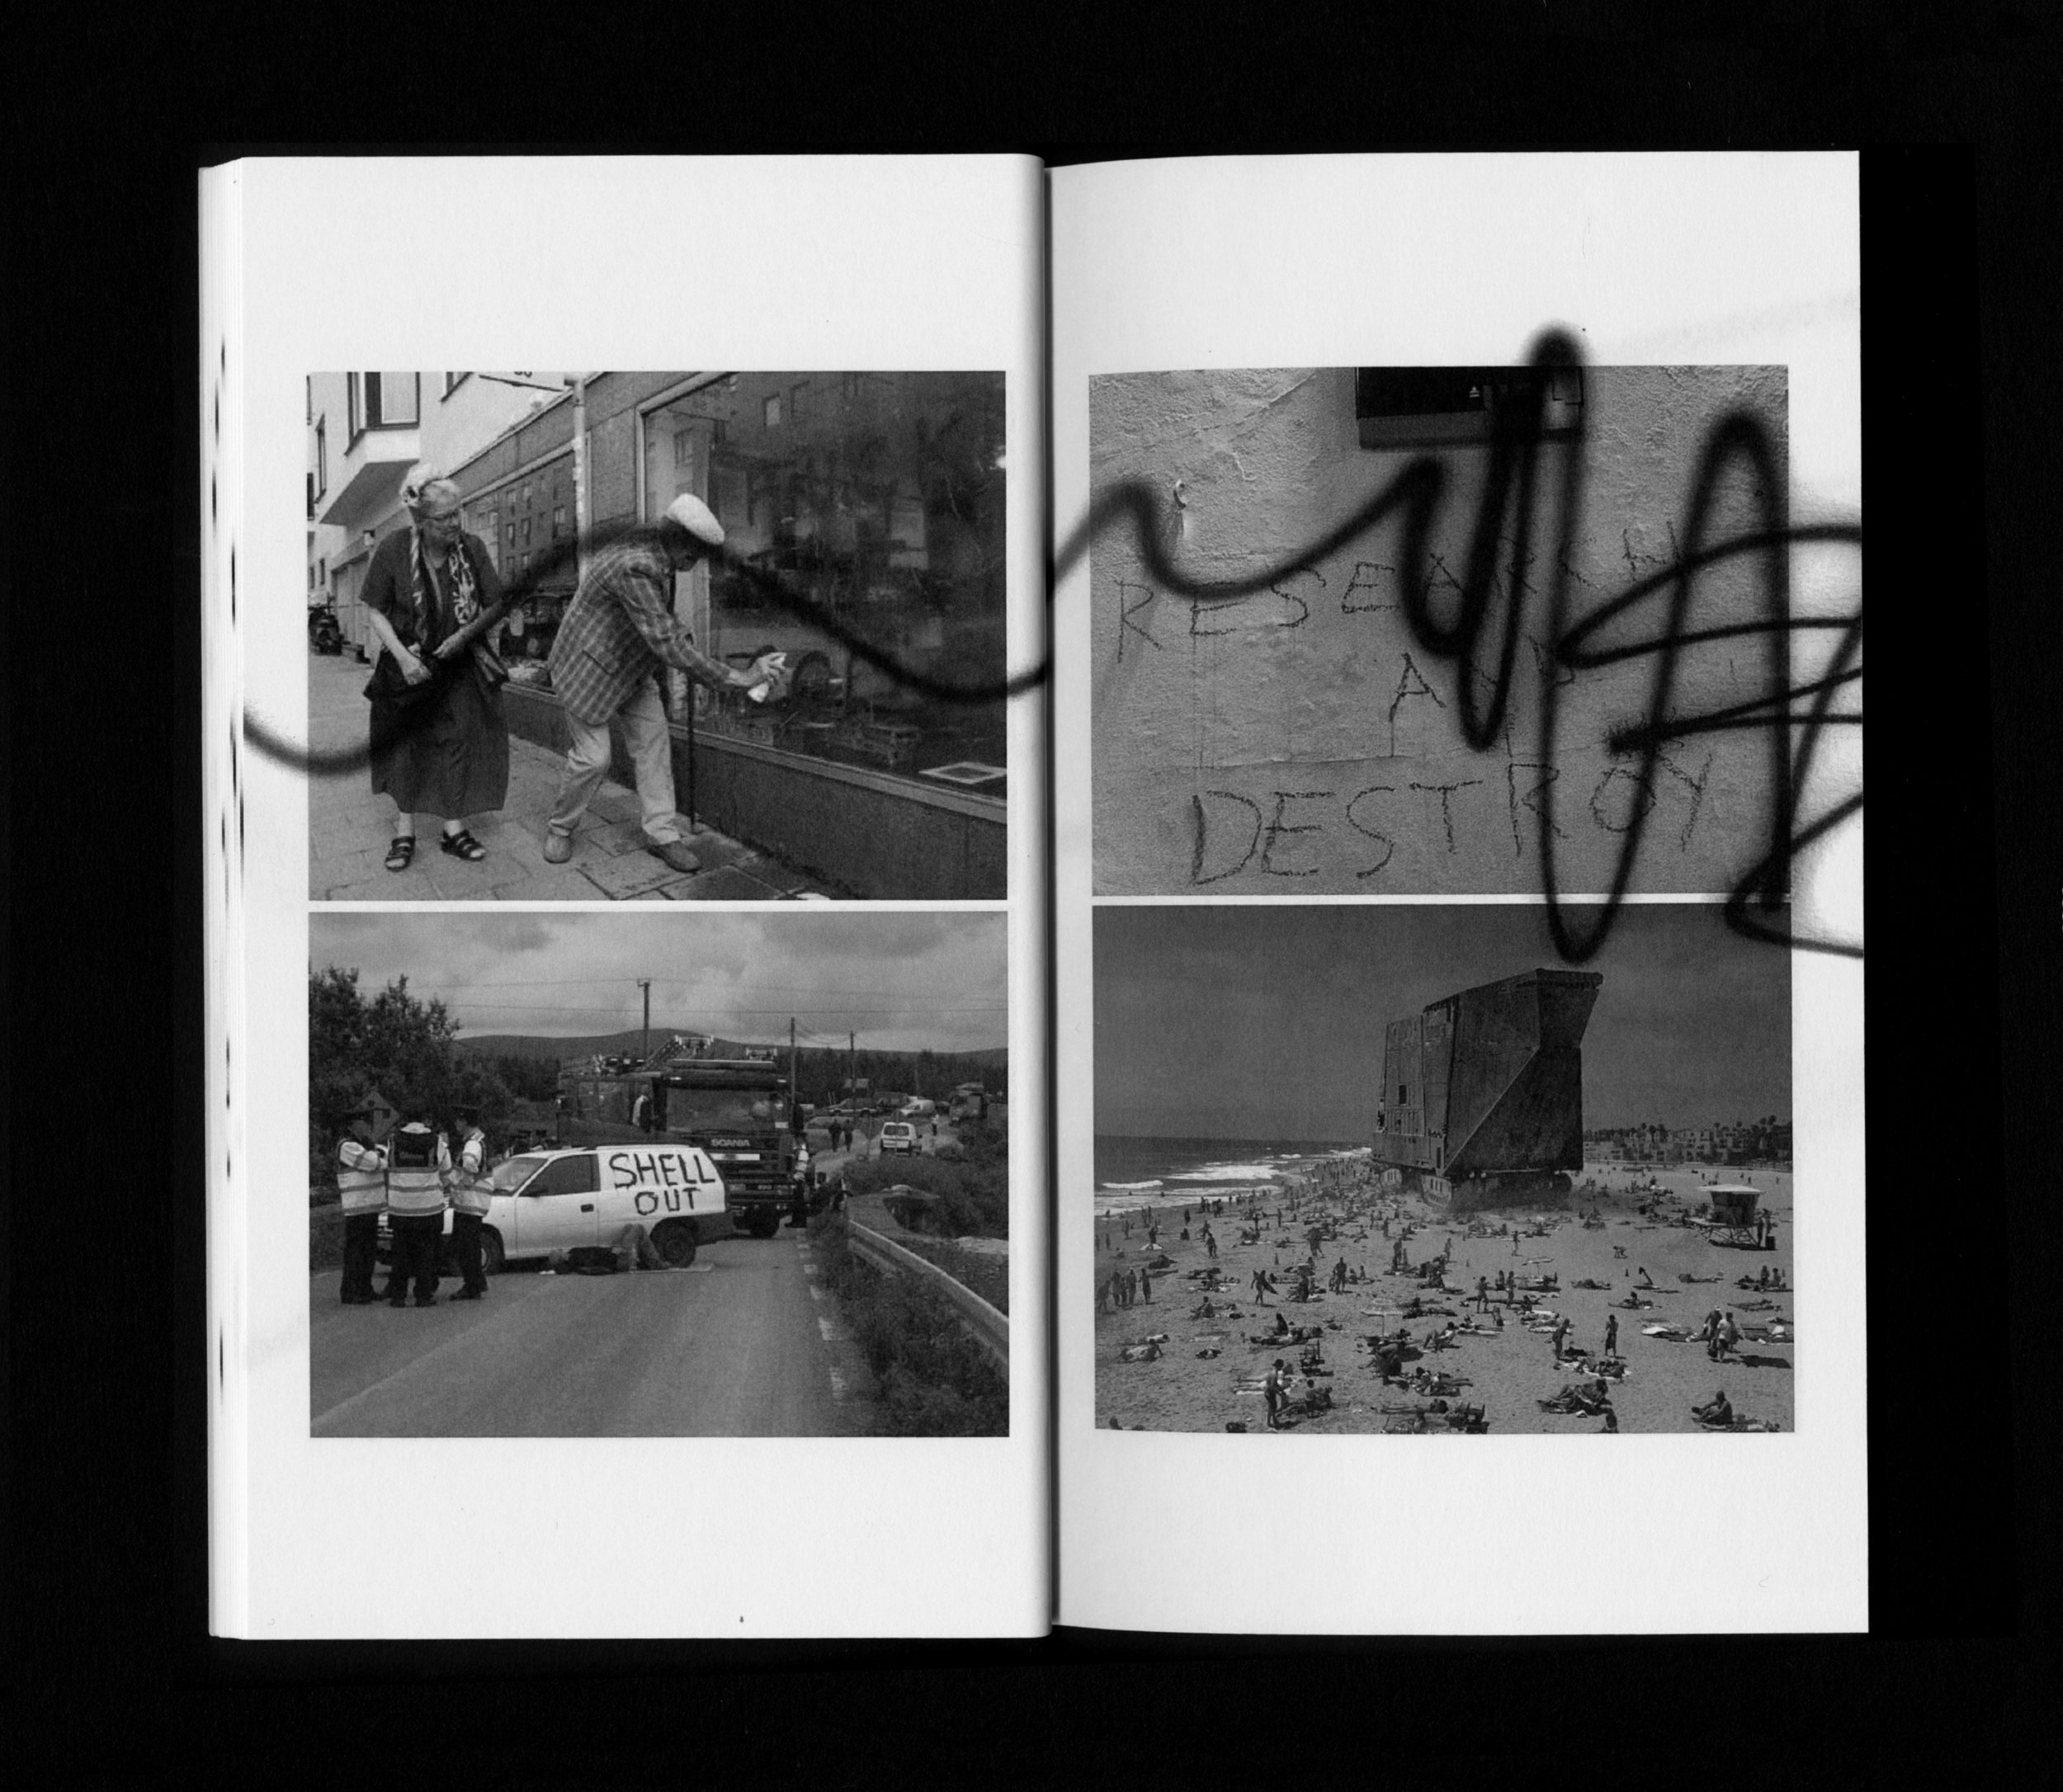 Frisk Flugt - Sabotage (60 pages). Spread. Published by Ovo Press, 2015